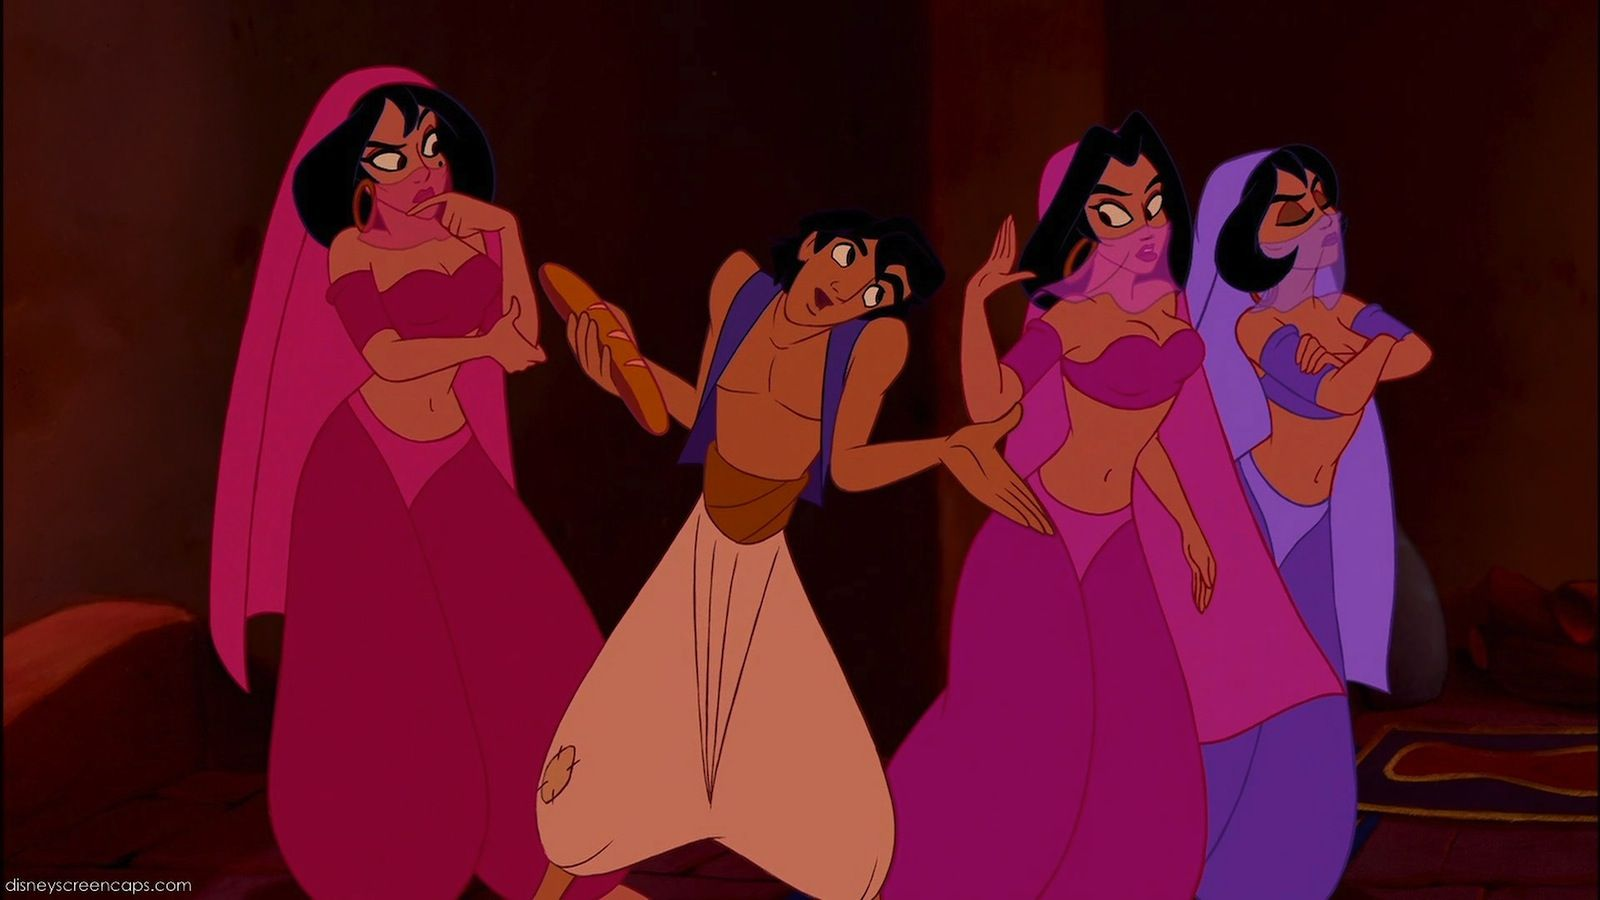 Harem Girls (Aladdin) | Harem girl and Disney stuff for Aladdin All Characters  181obs